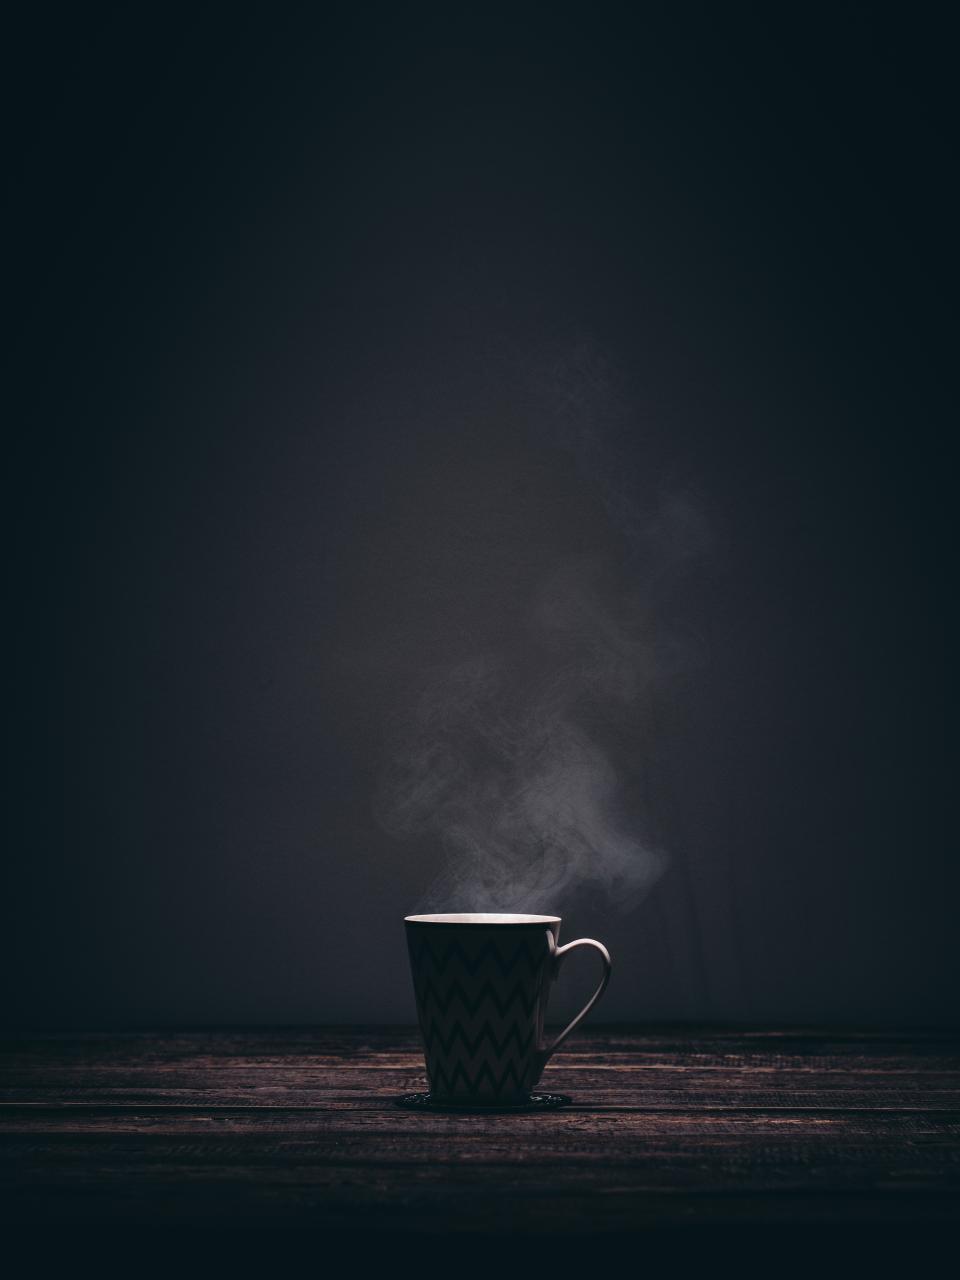 cup, mug, steaming, smoke, coffee, tea, drink, dark, table